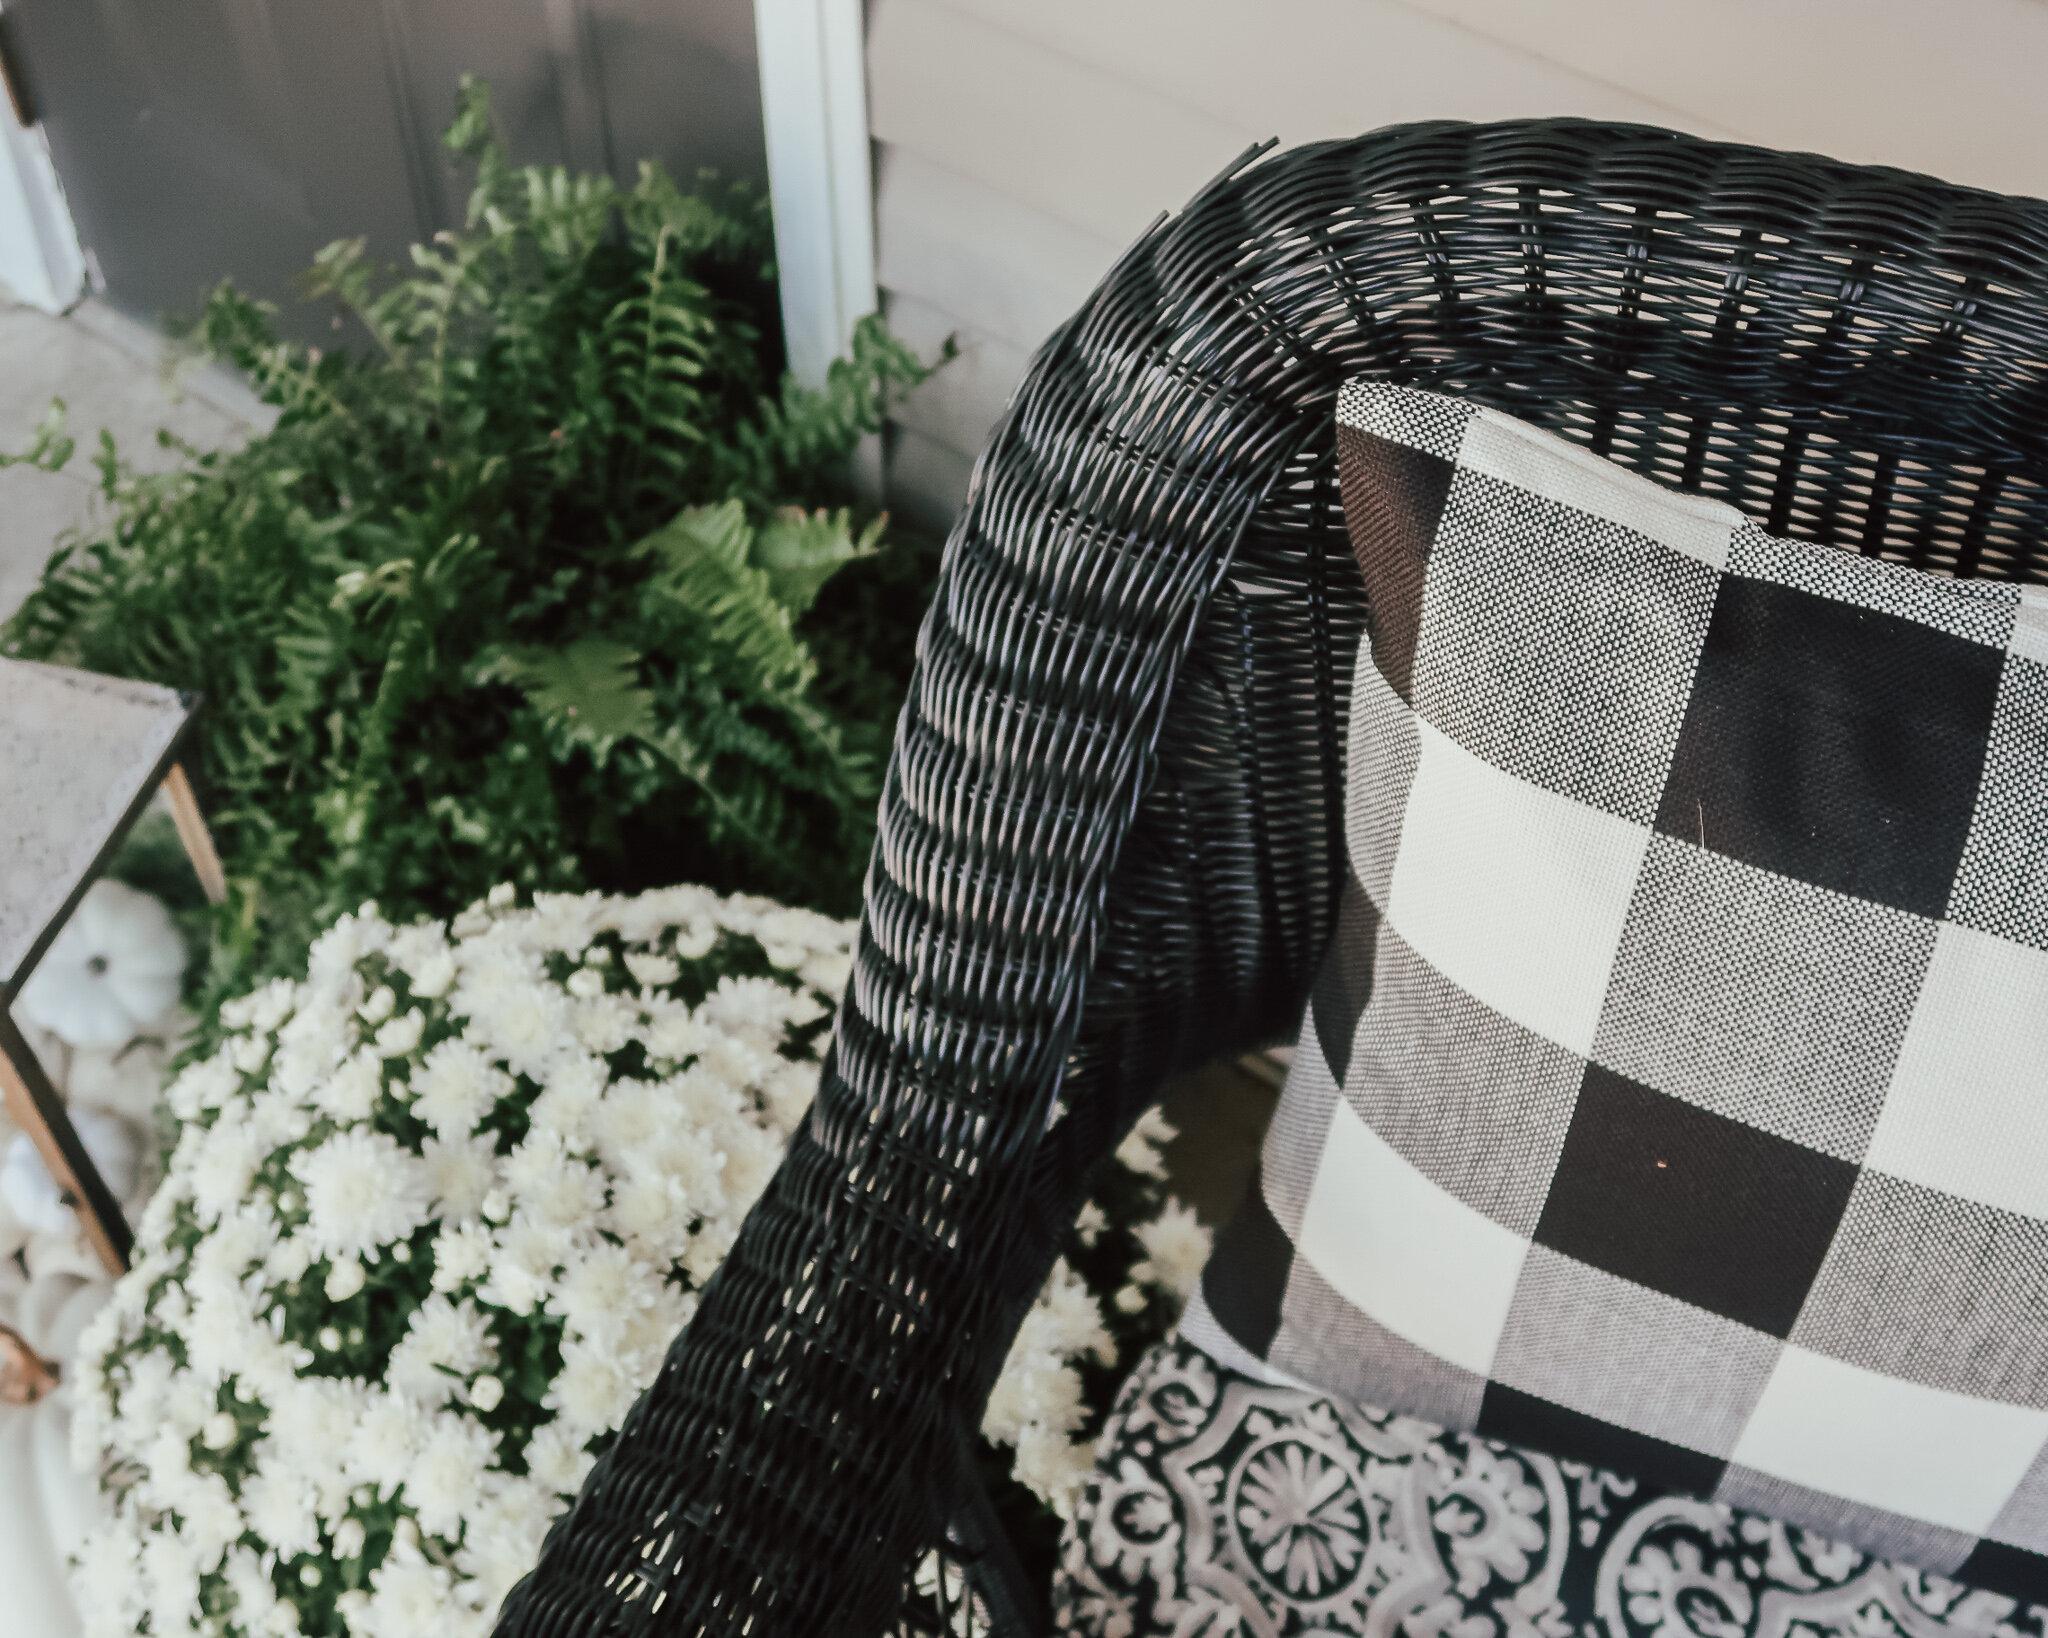 fall-front-porch-decor-18.jpg